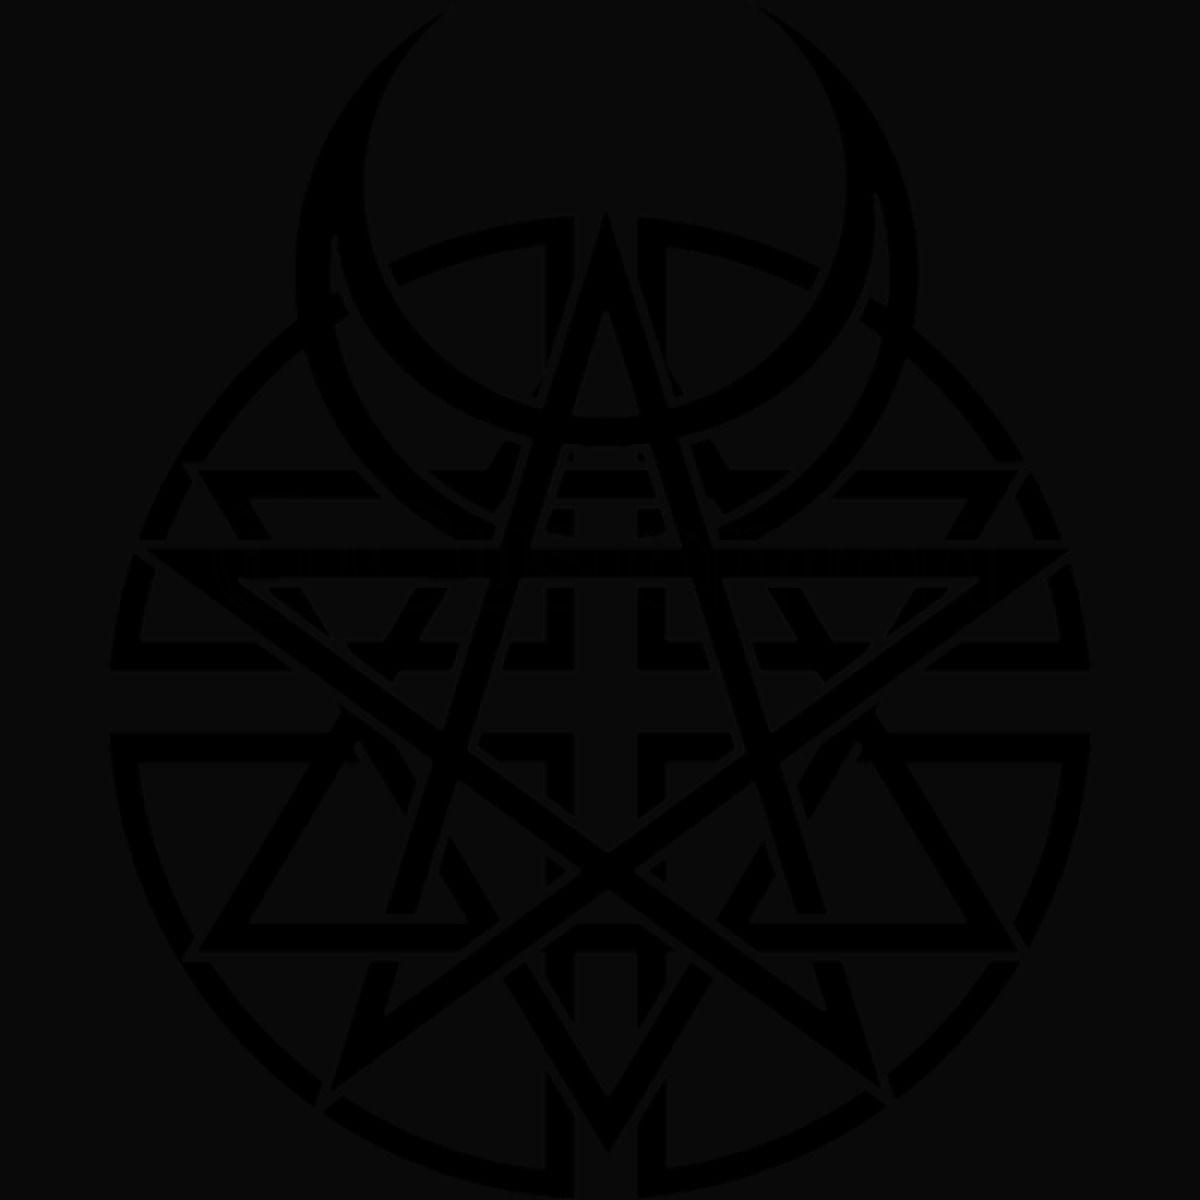 Disturbed band logo